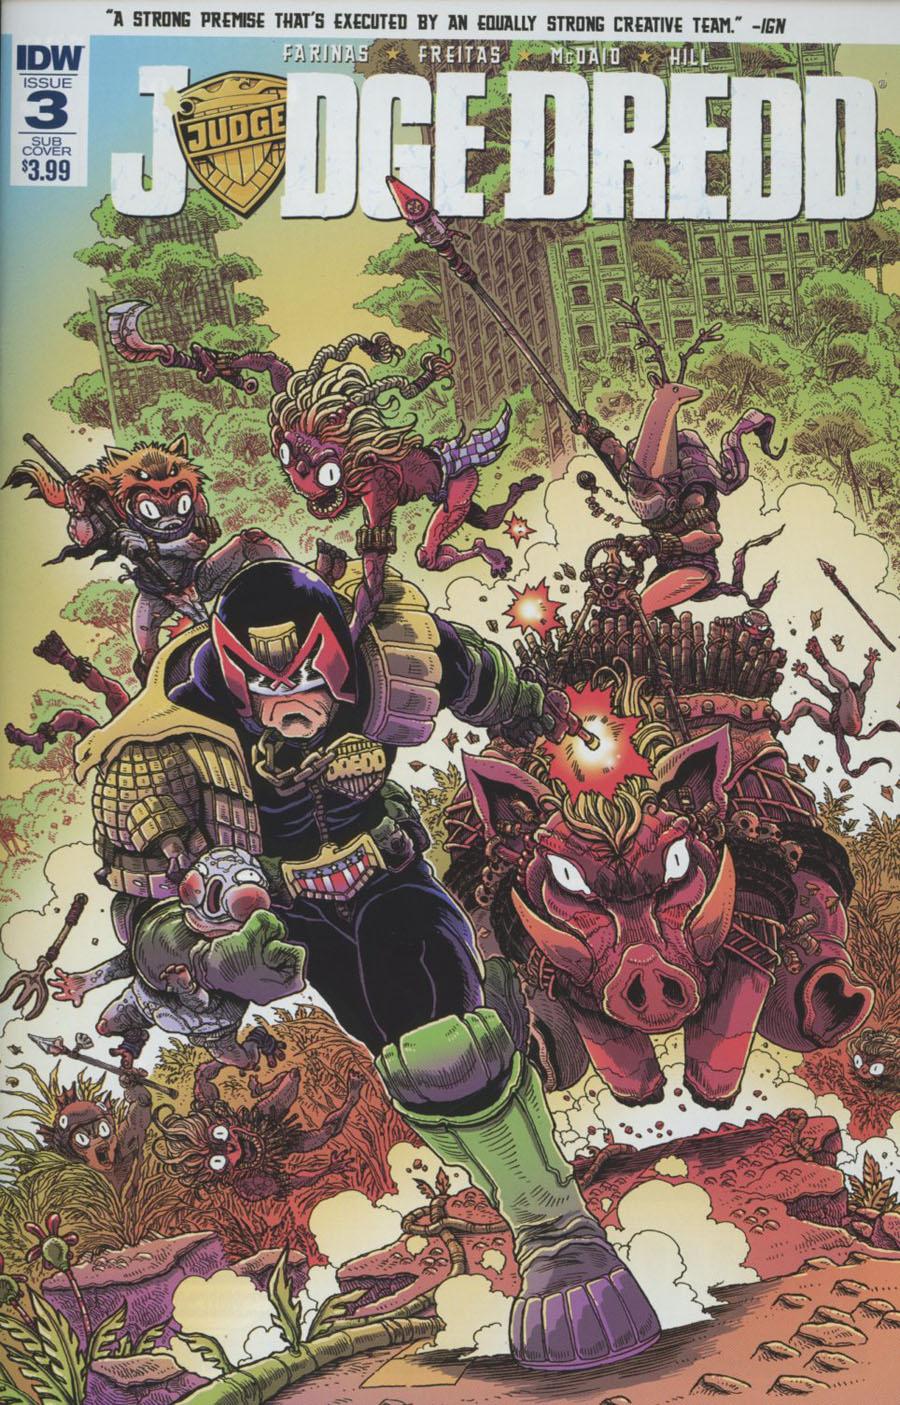 Judge Dredd Vol 5 #3 Cover B Variant James Stokoe Subscription Cover